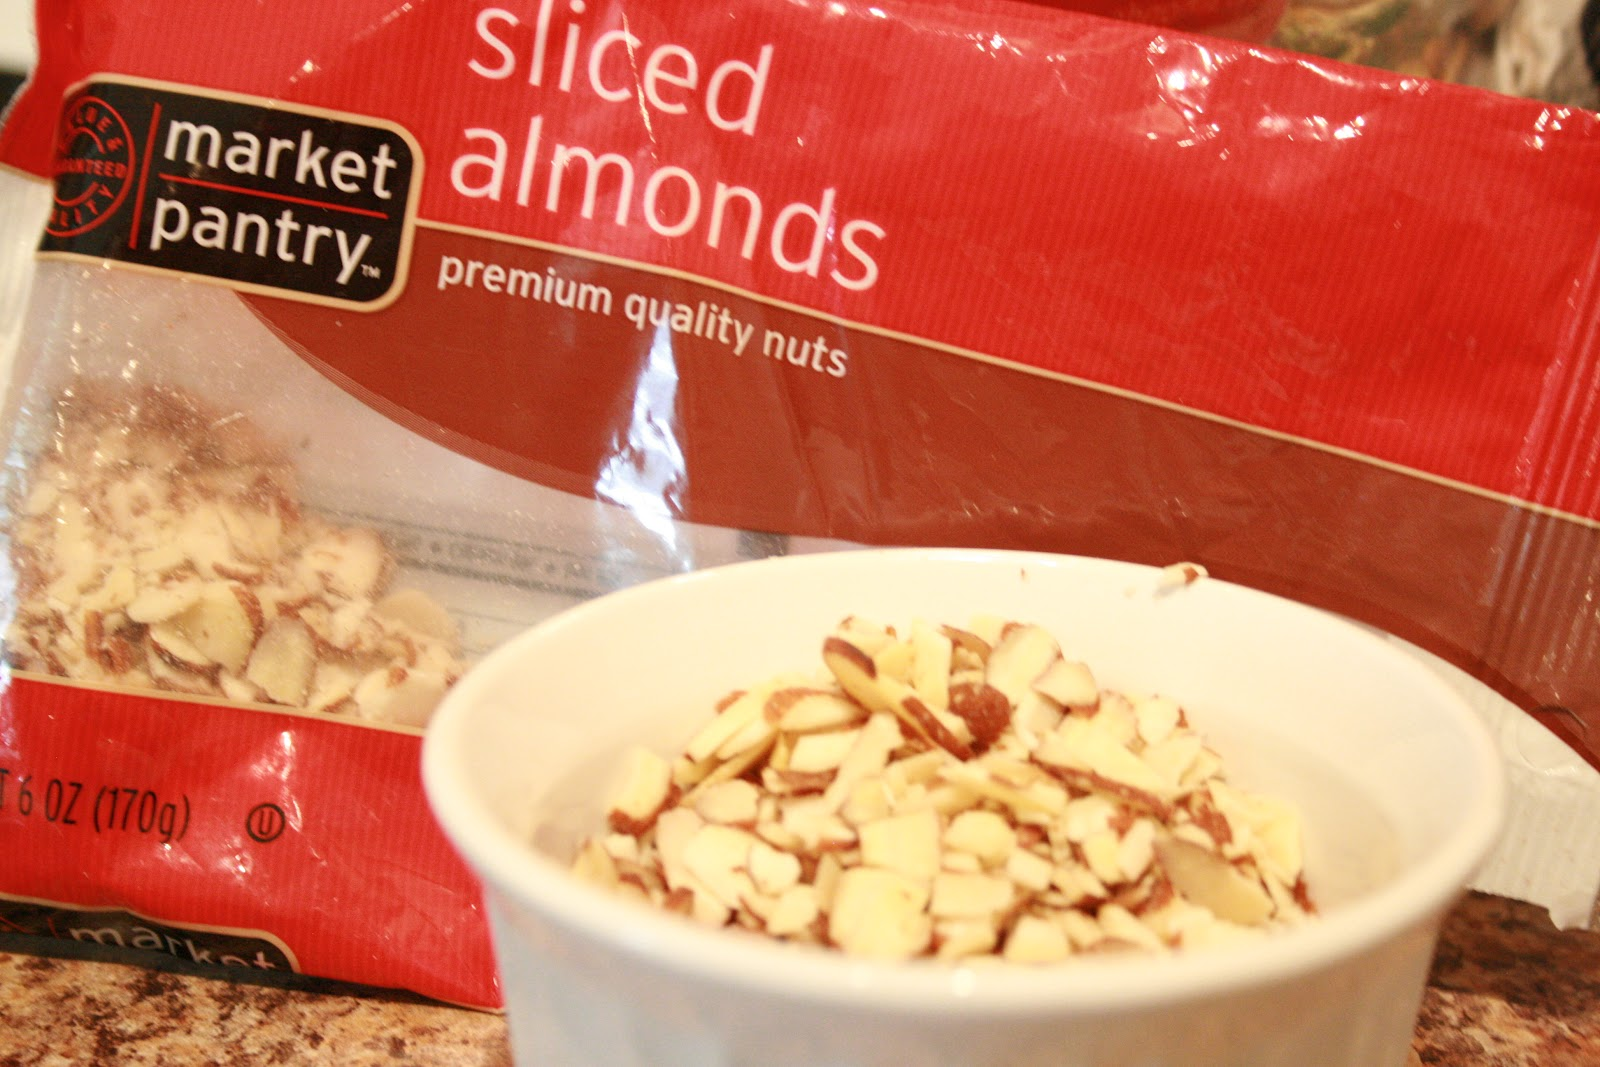 Life Skills 101: Week 2 : Toffee-Almond Popcorn Balls